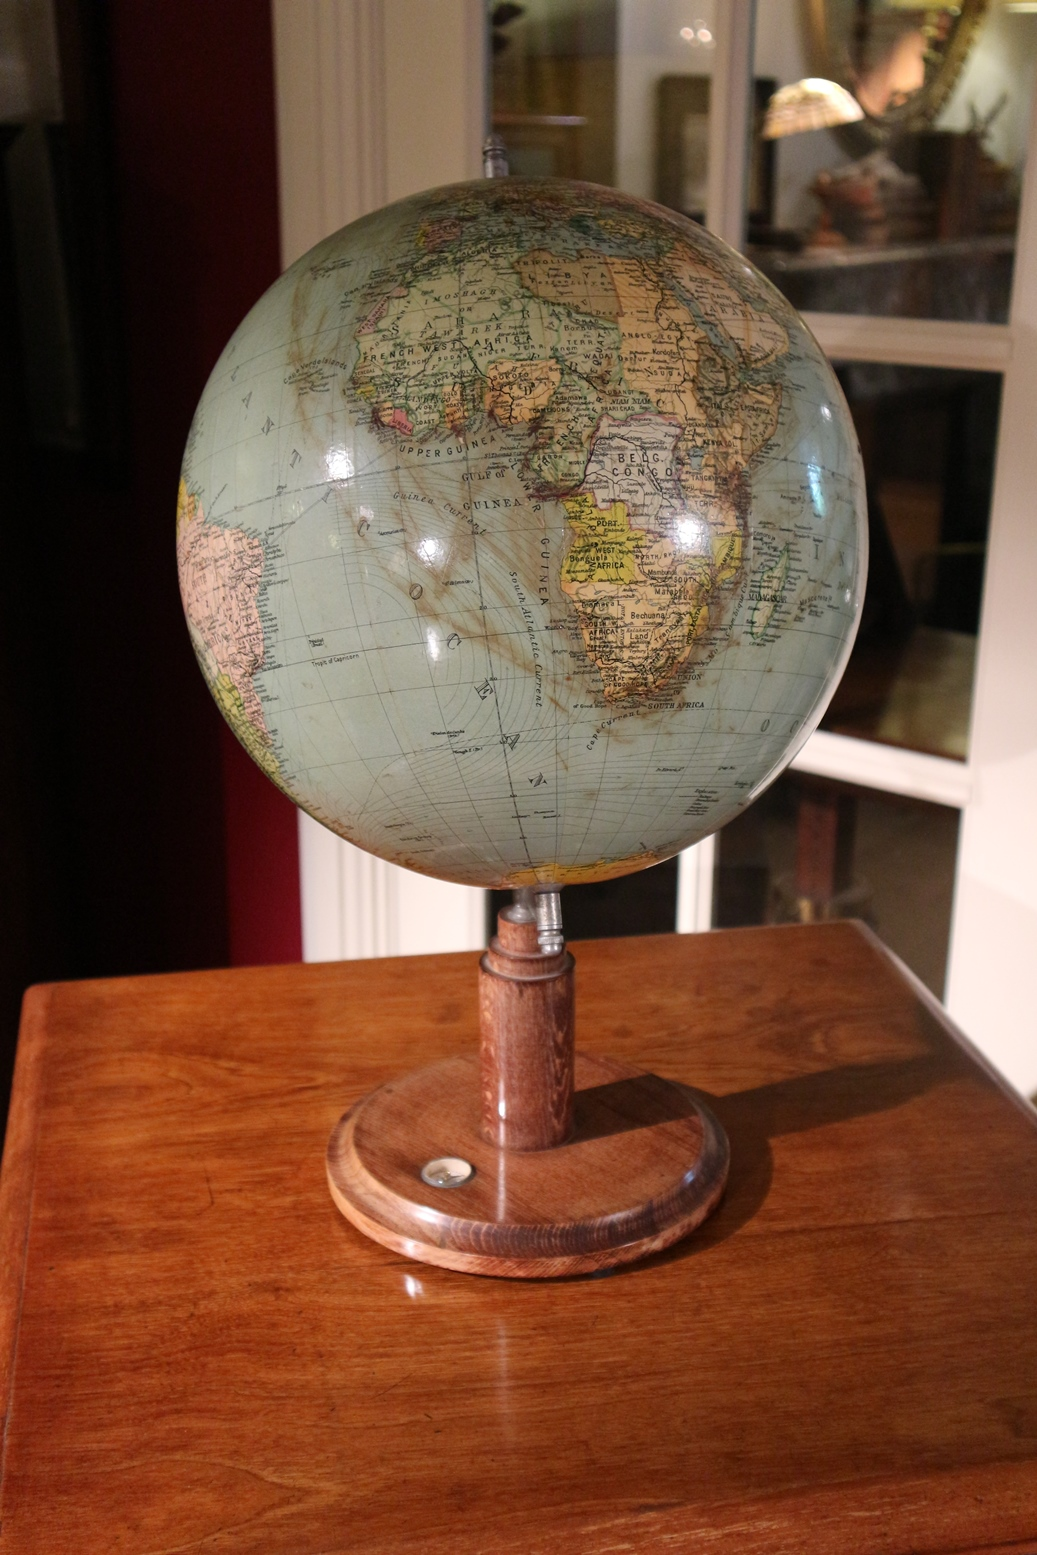 Verbazingwekkend Oude Globe / wereldbol - Antiek Arcade de specialist in Engels antiek WJ-13